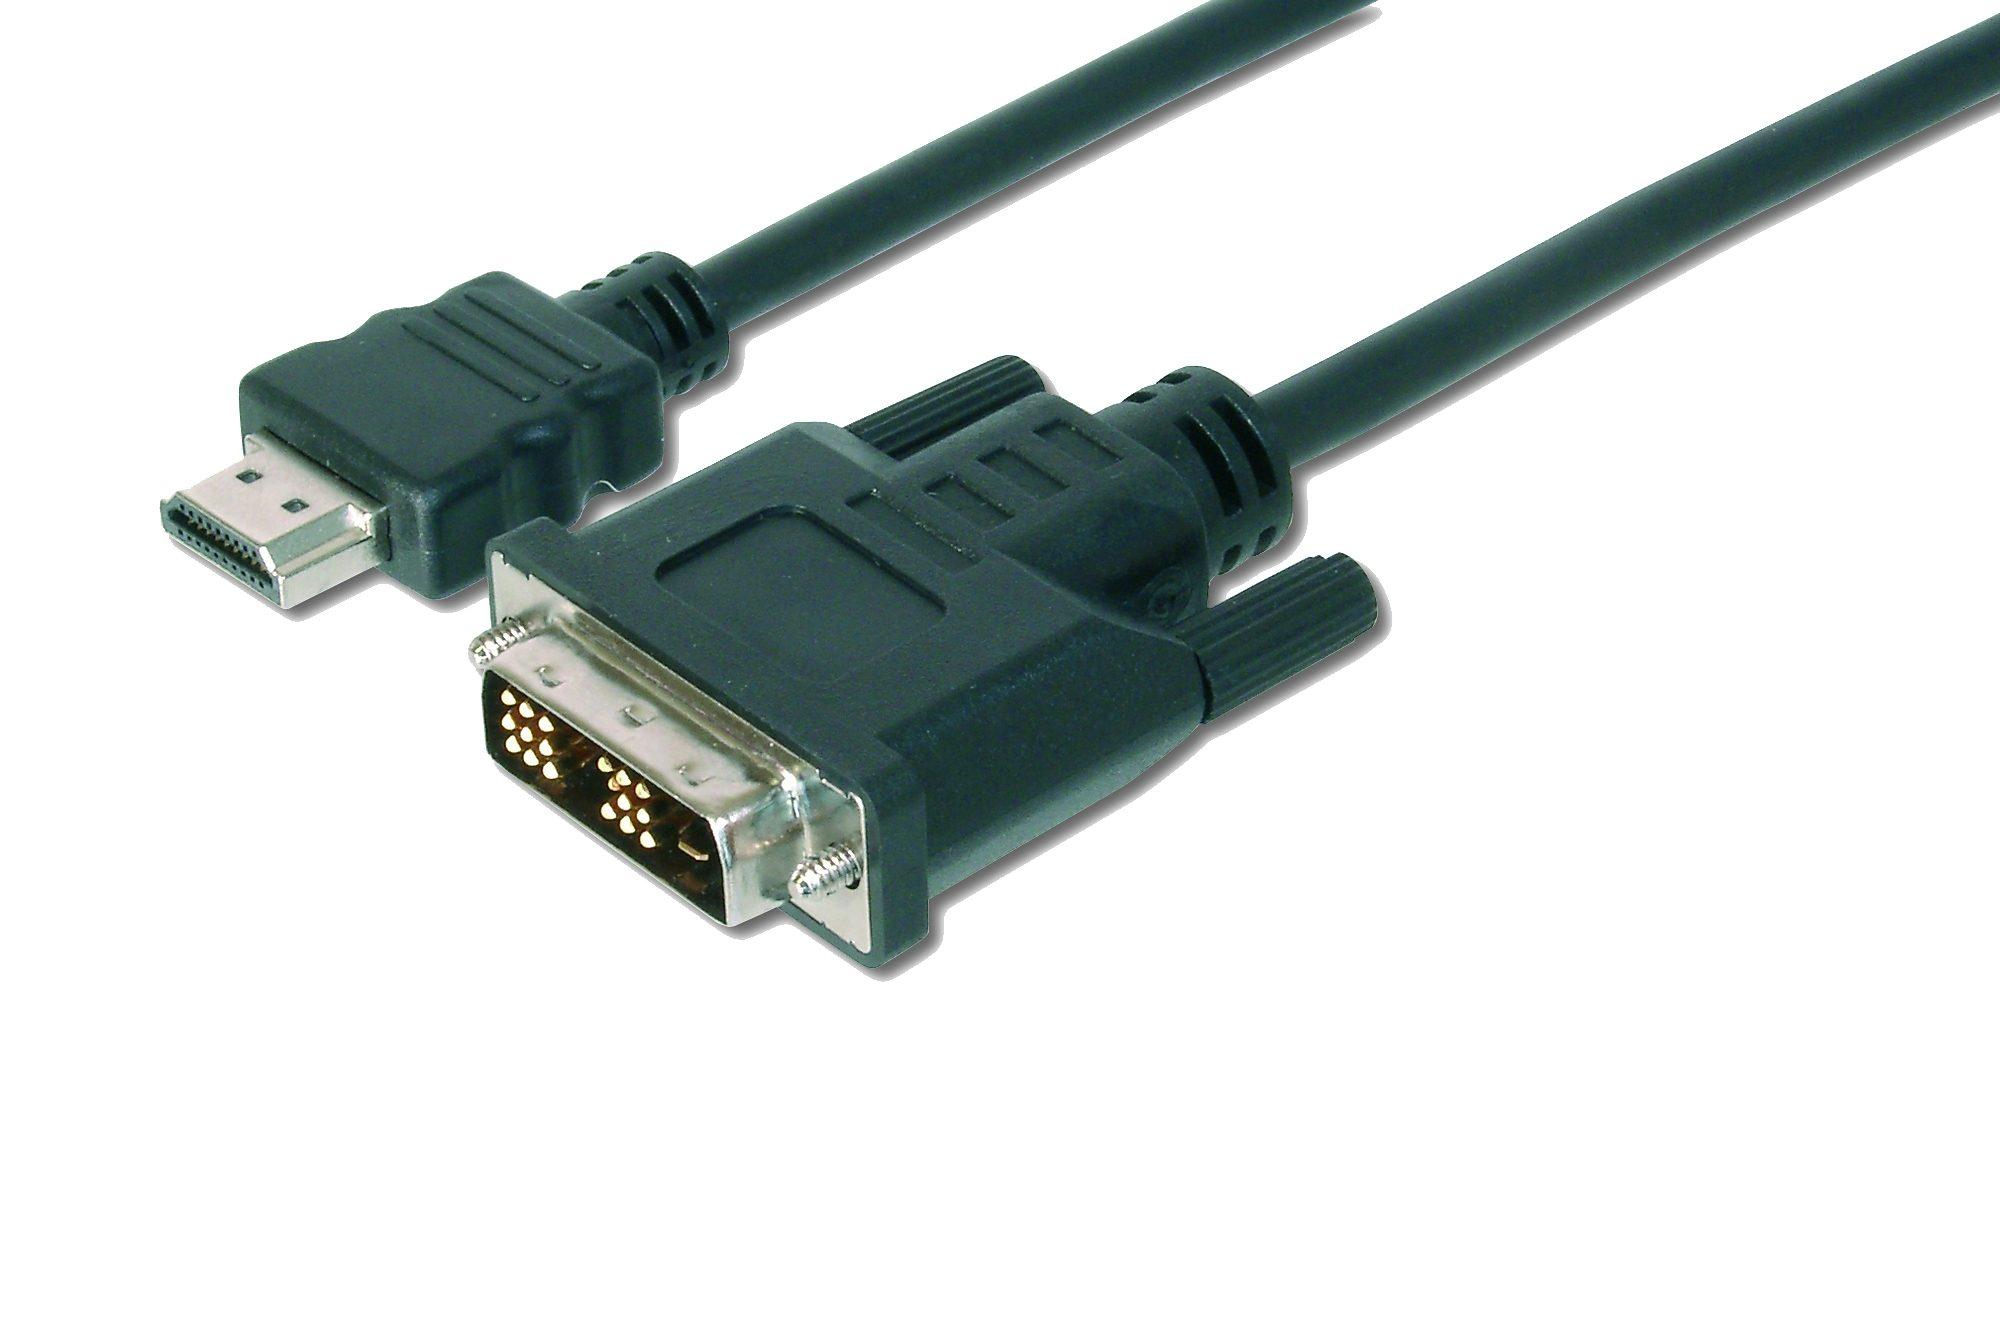 Ednet HDMI »HDMI Adapterkabel, Typ A-DVI(18+1), St/St, 2.0m«